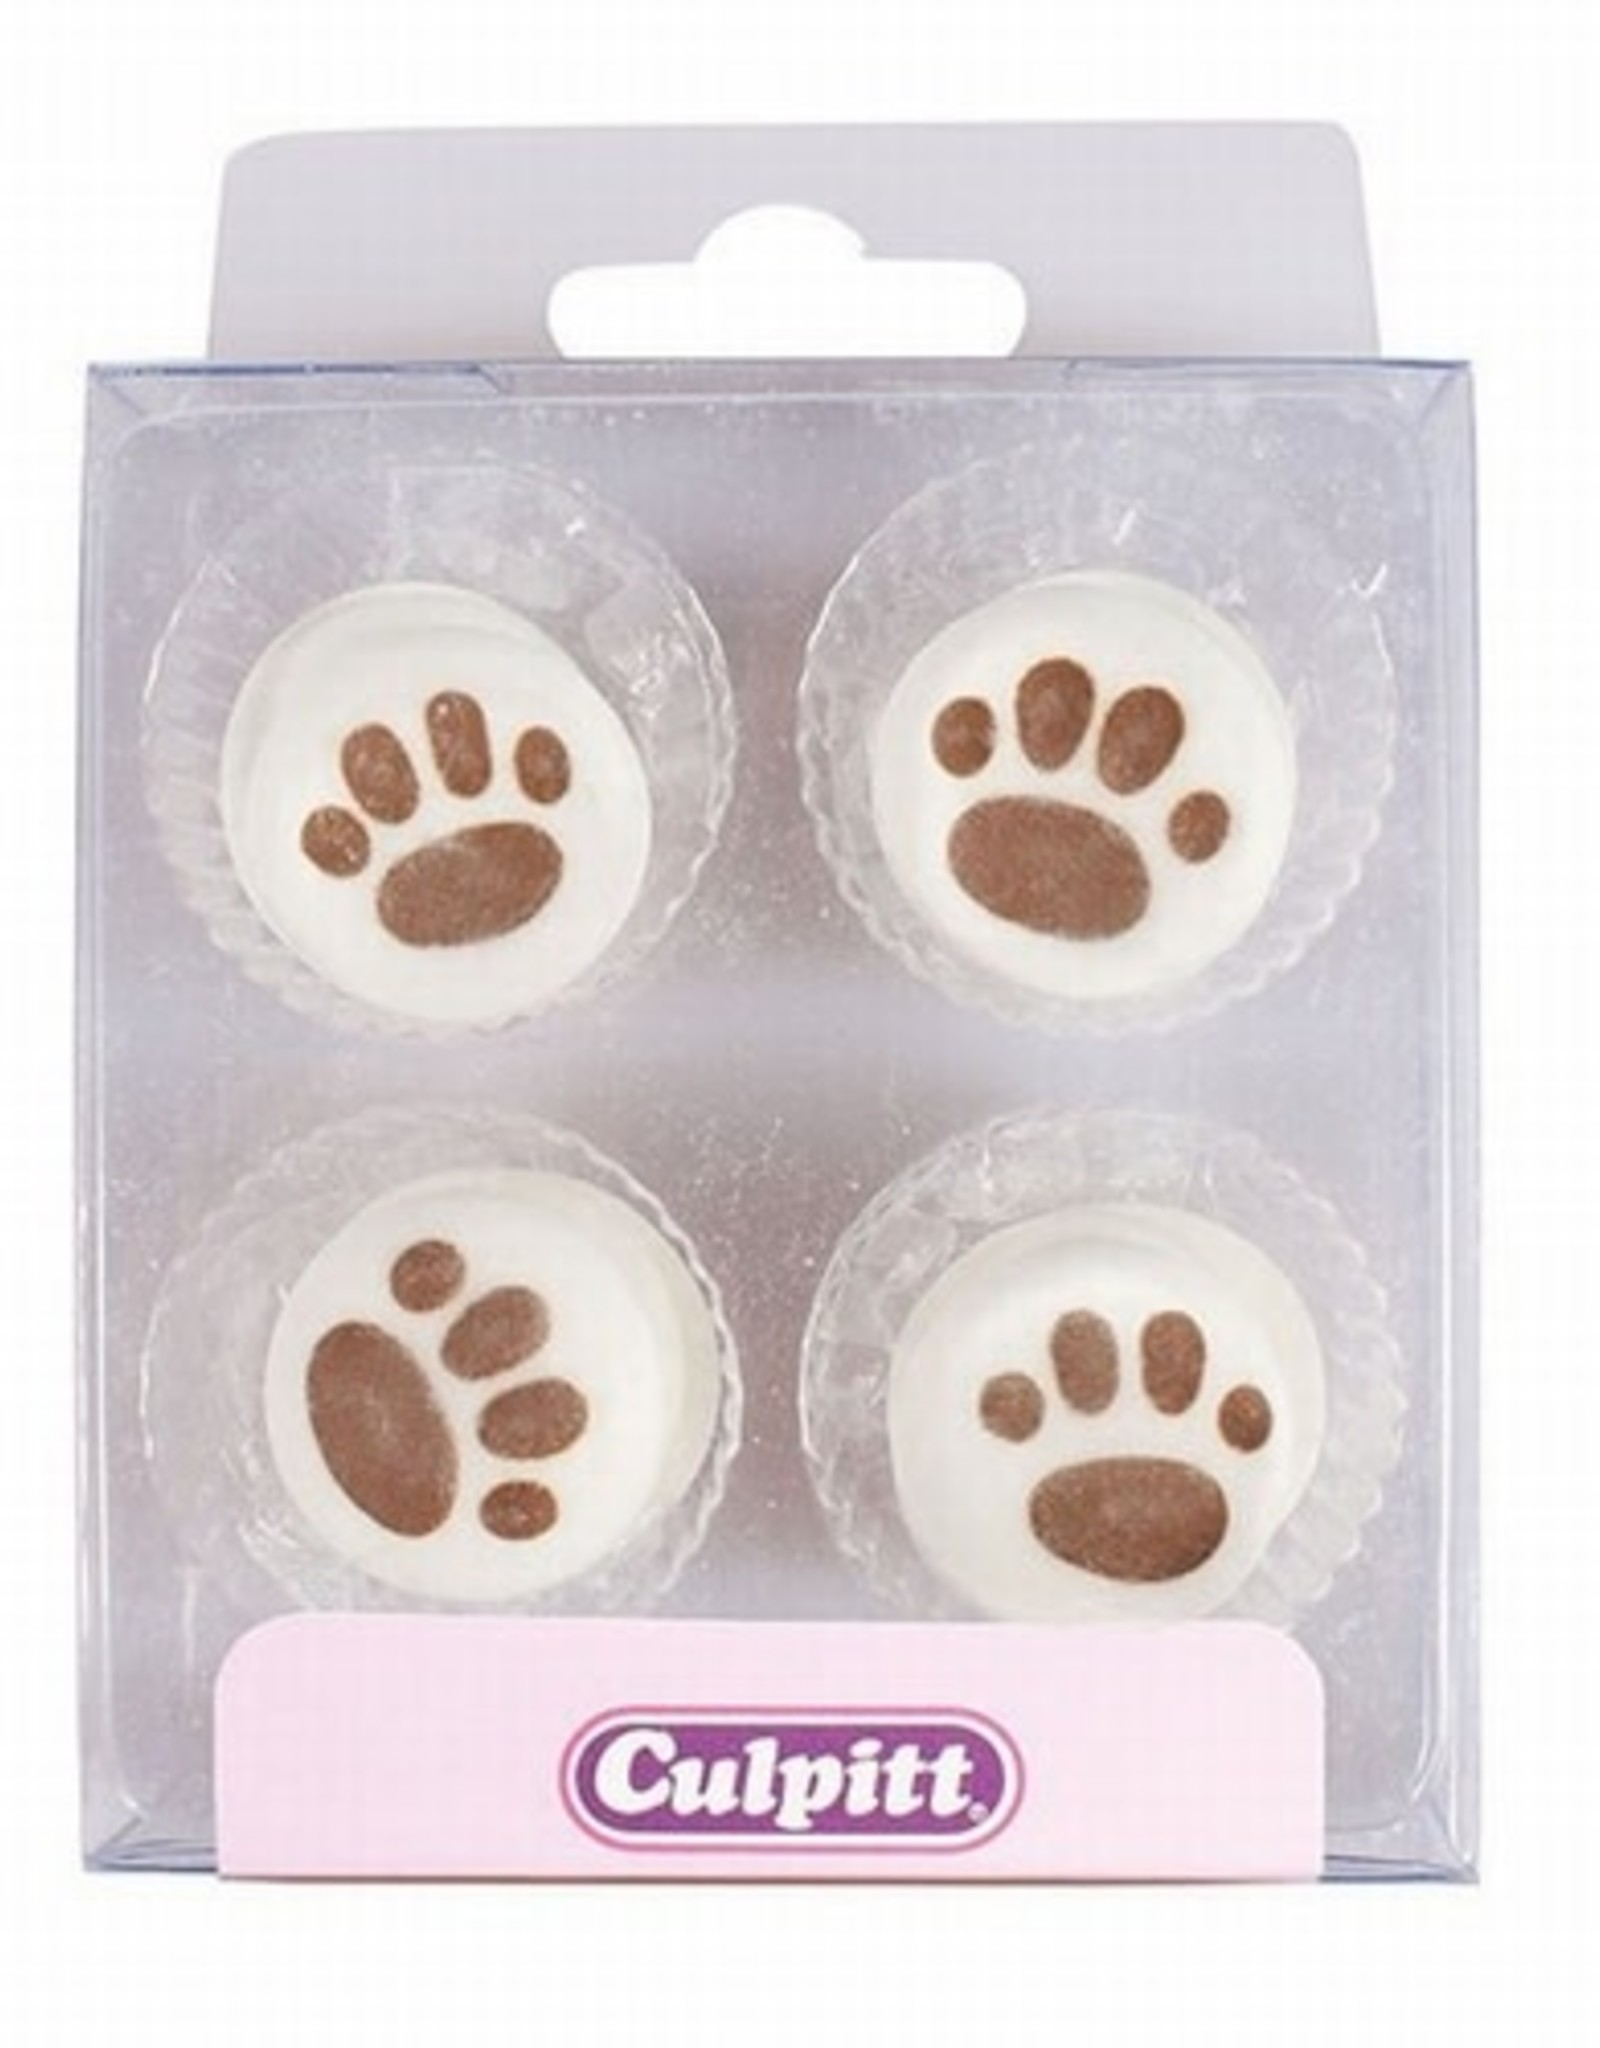 Culpitt Culpitt Suikerdecoratie Pootafdruk pk/12